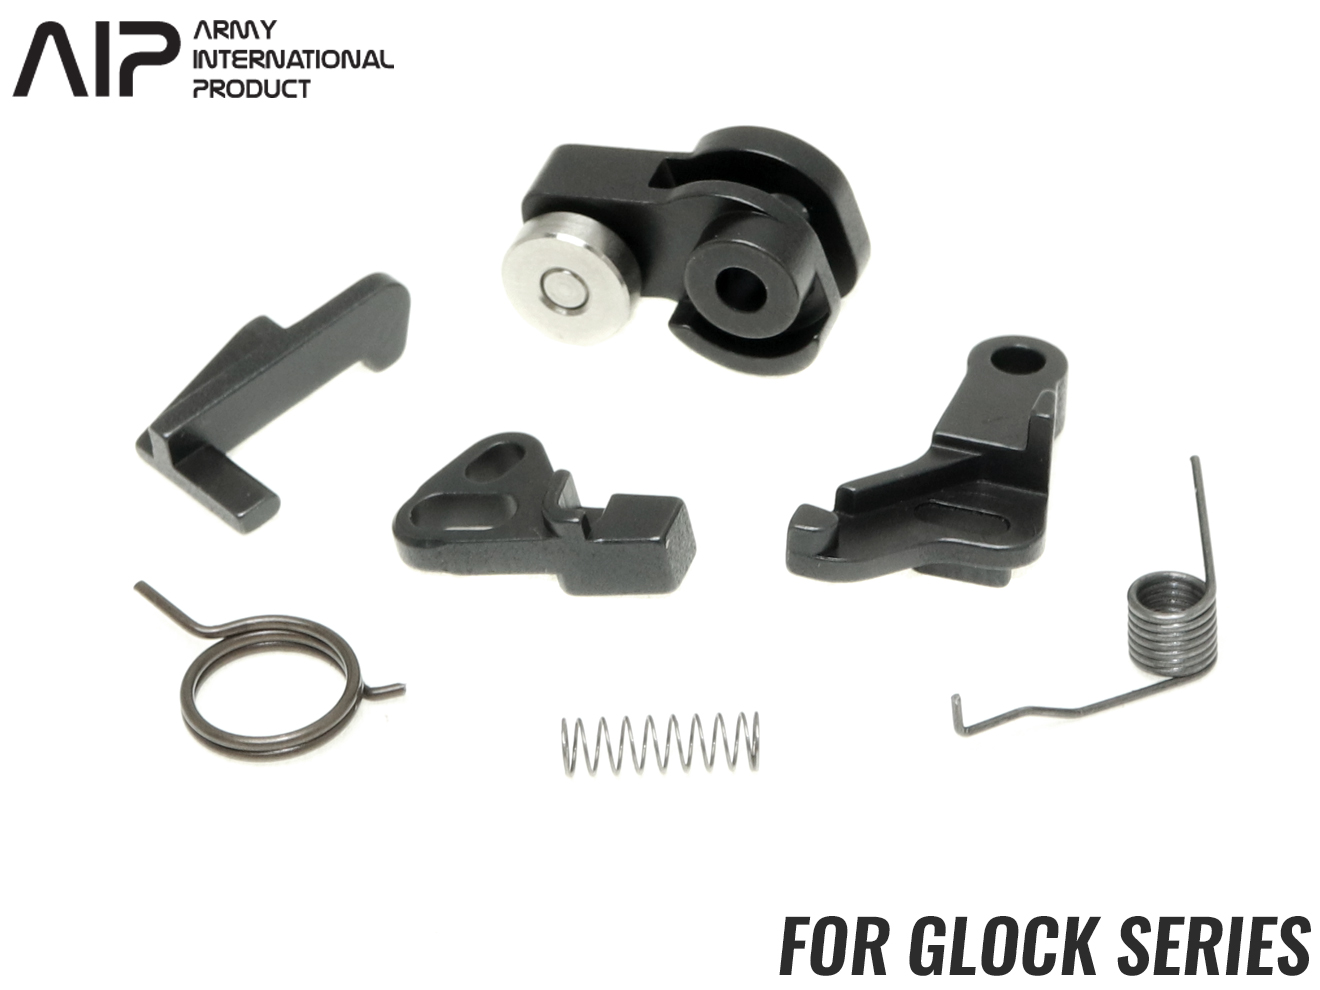 AIP スチールCNC ハンマーセット G17/G22/G26/G34◆東京マルイ GBB GLOCK 高精度CNC加工 強度耐久性UP シアー/ノッカー/ノッカーロック付属